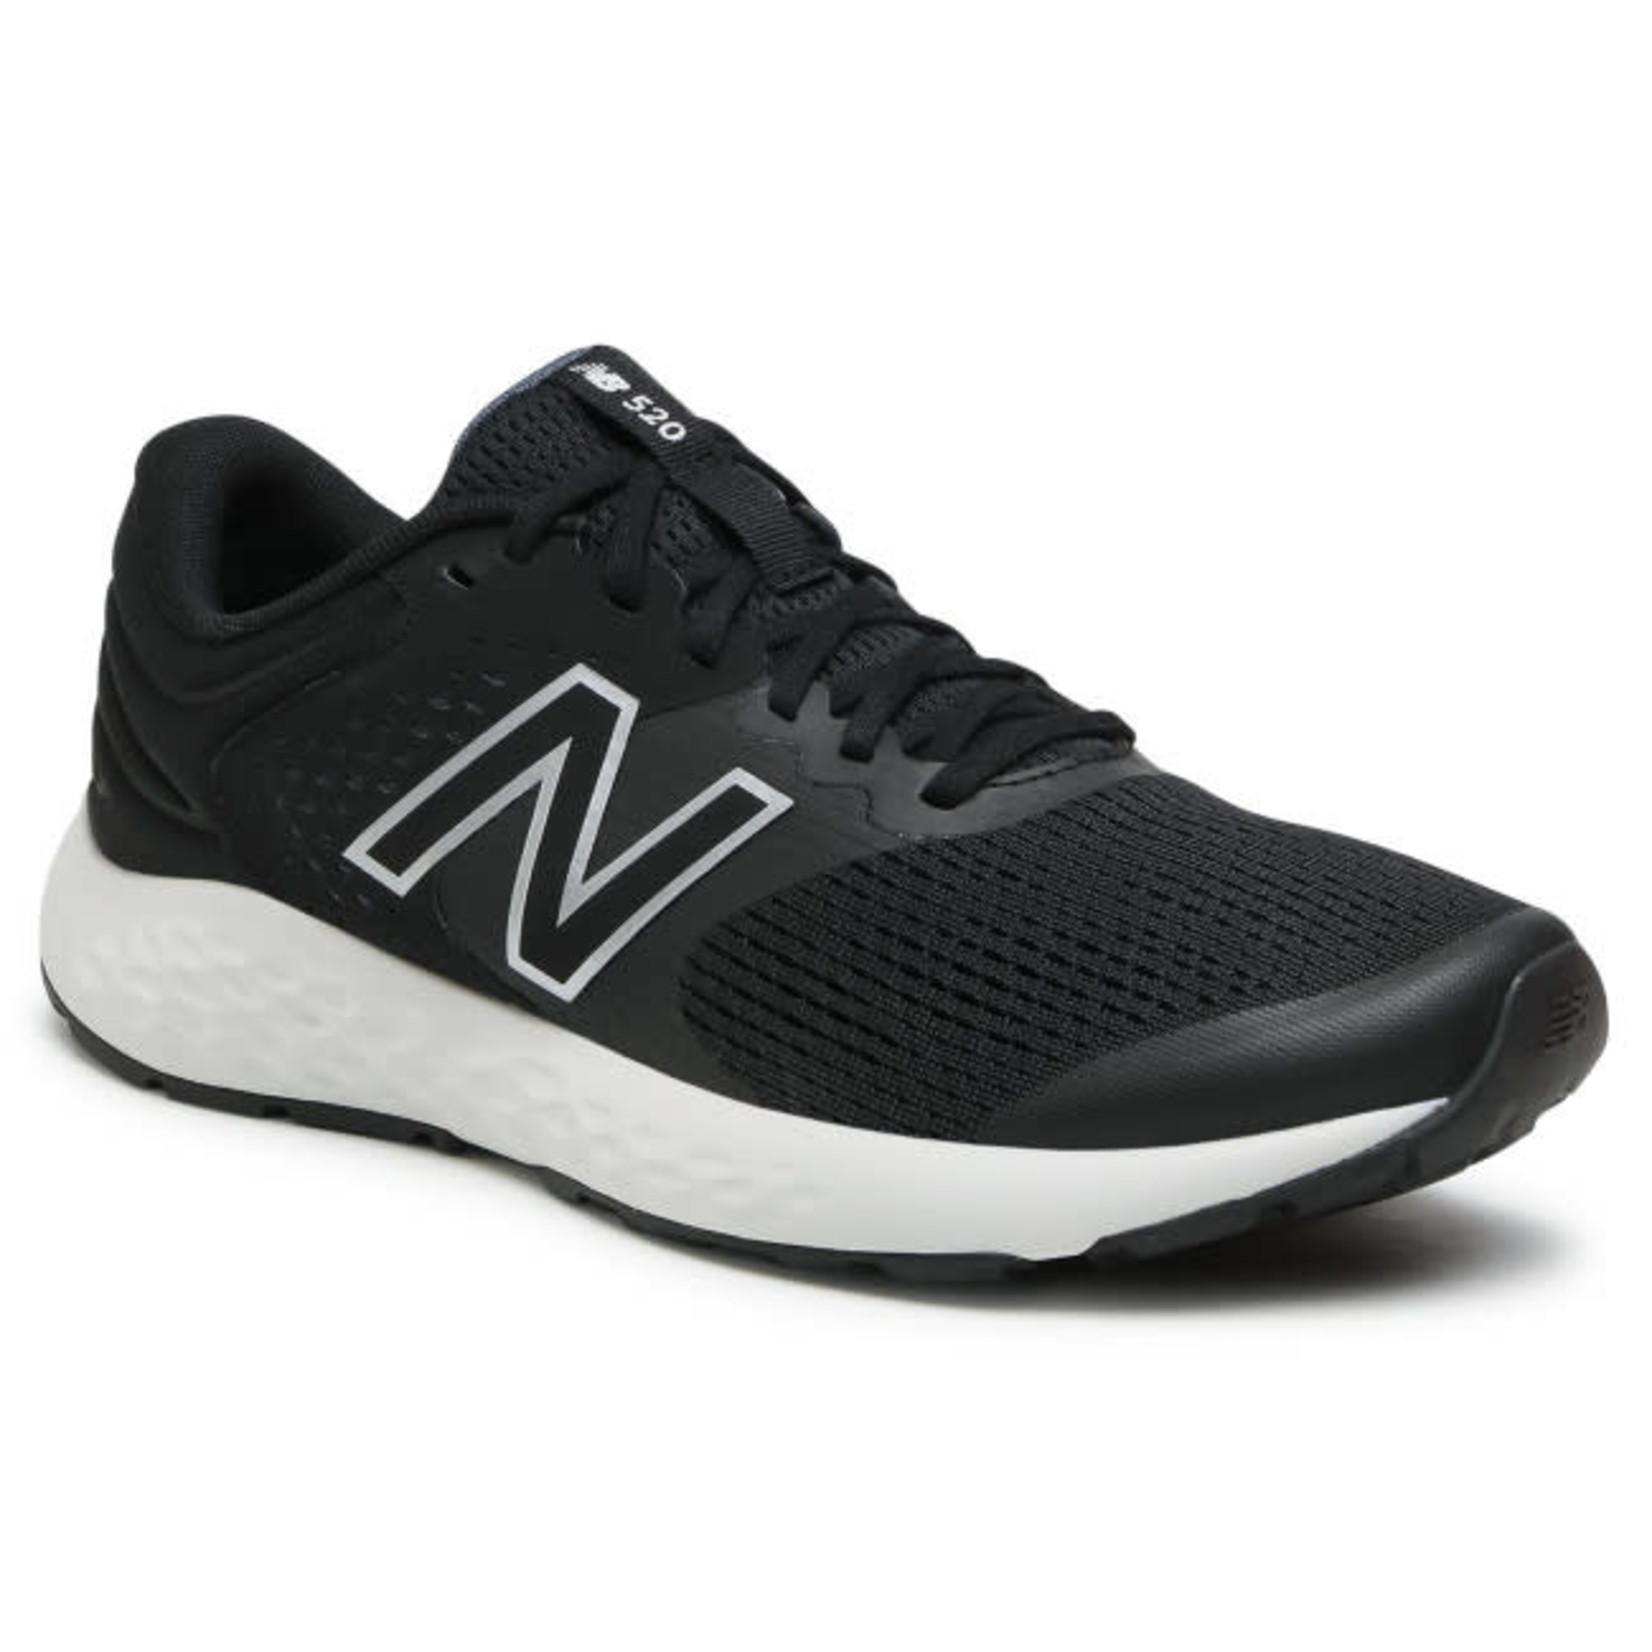 New Balance New Balance Running Shoes, M520LB7, Mens